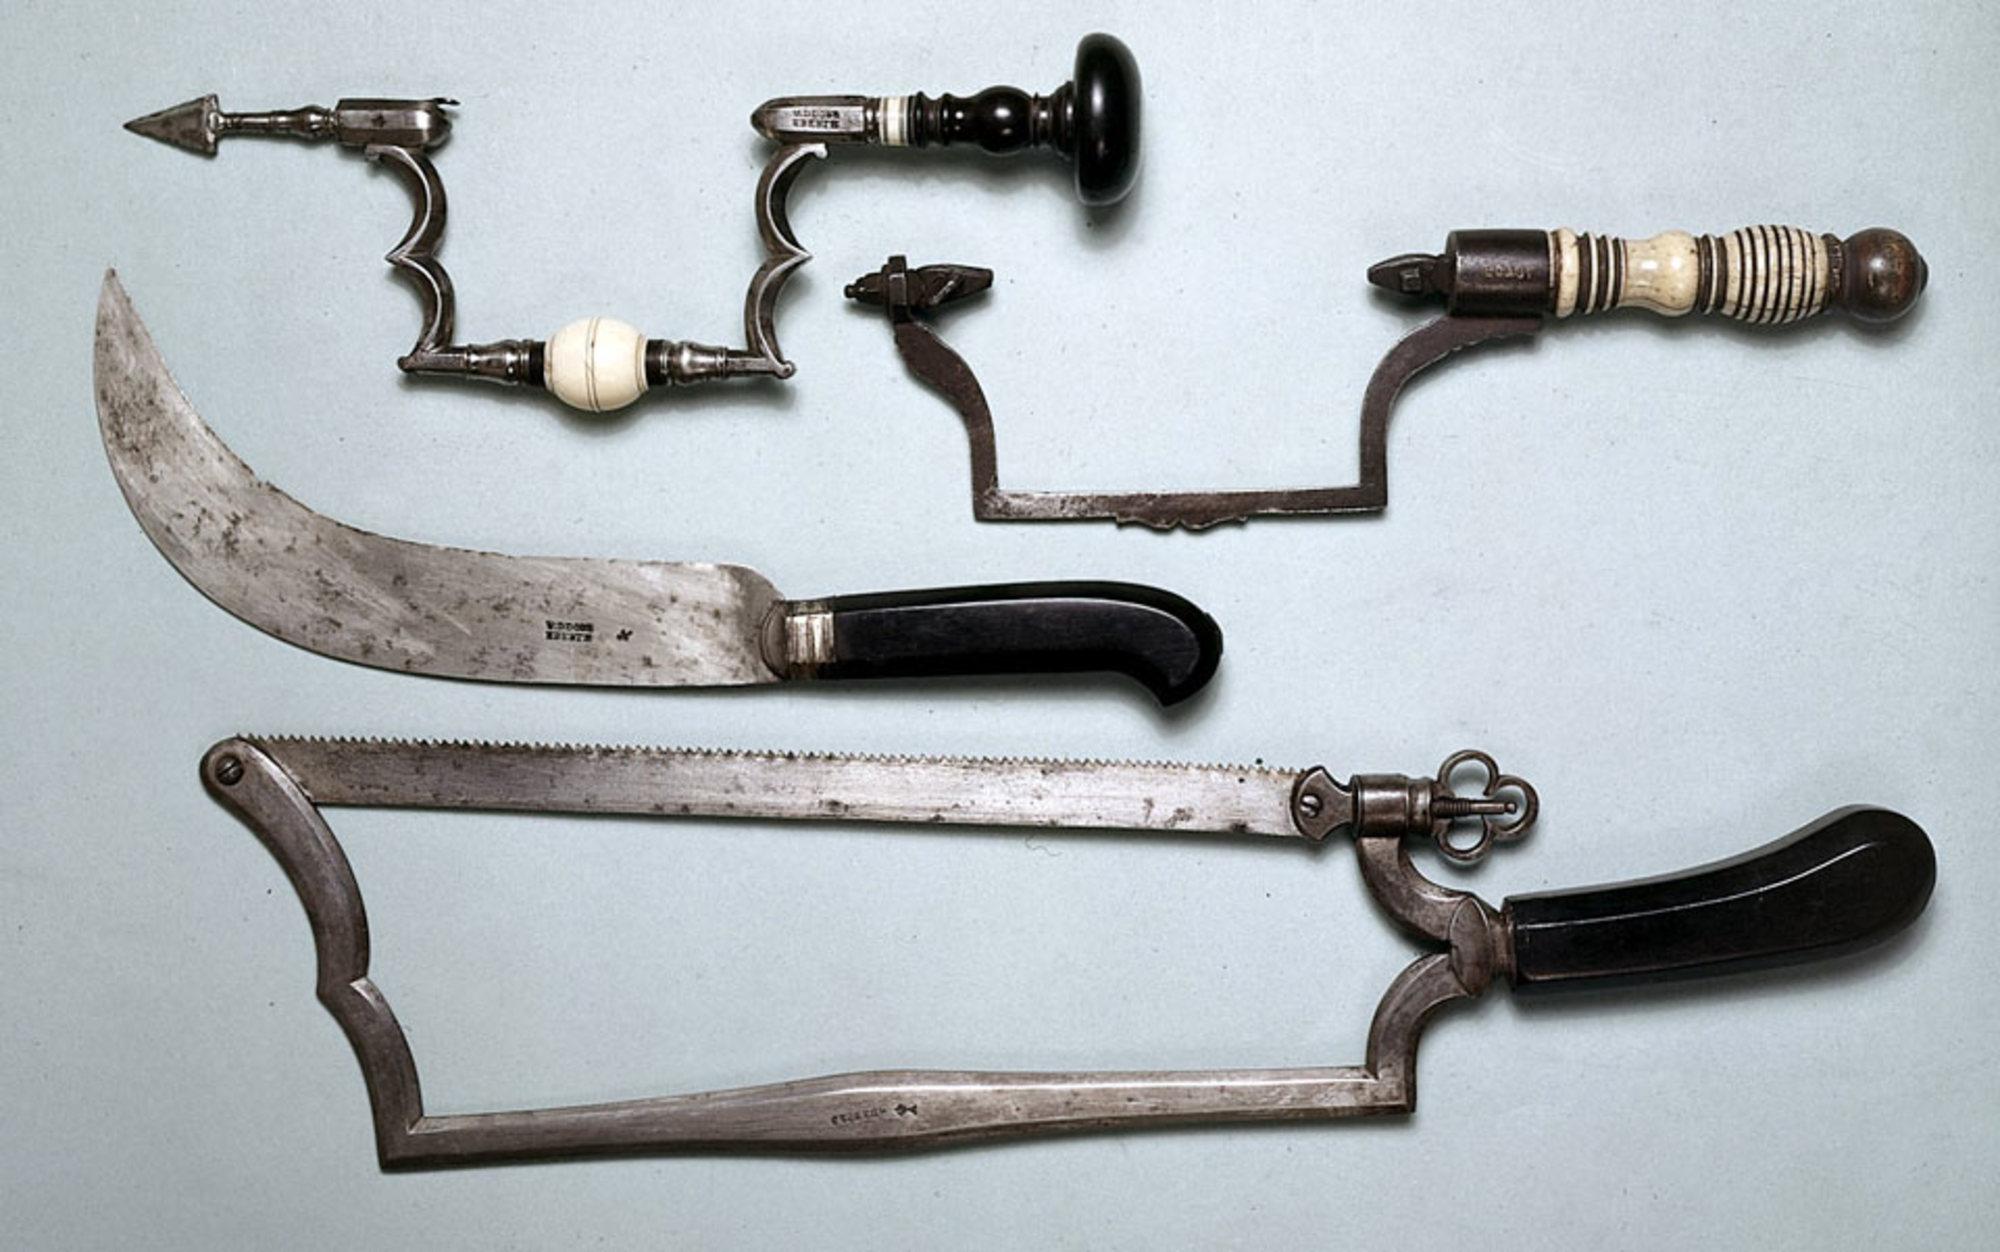 Header surgeons kit